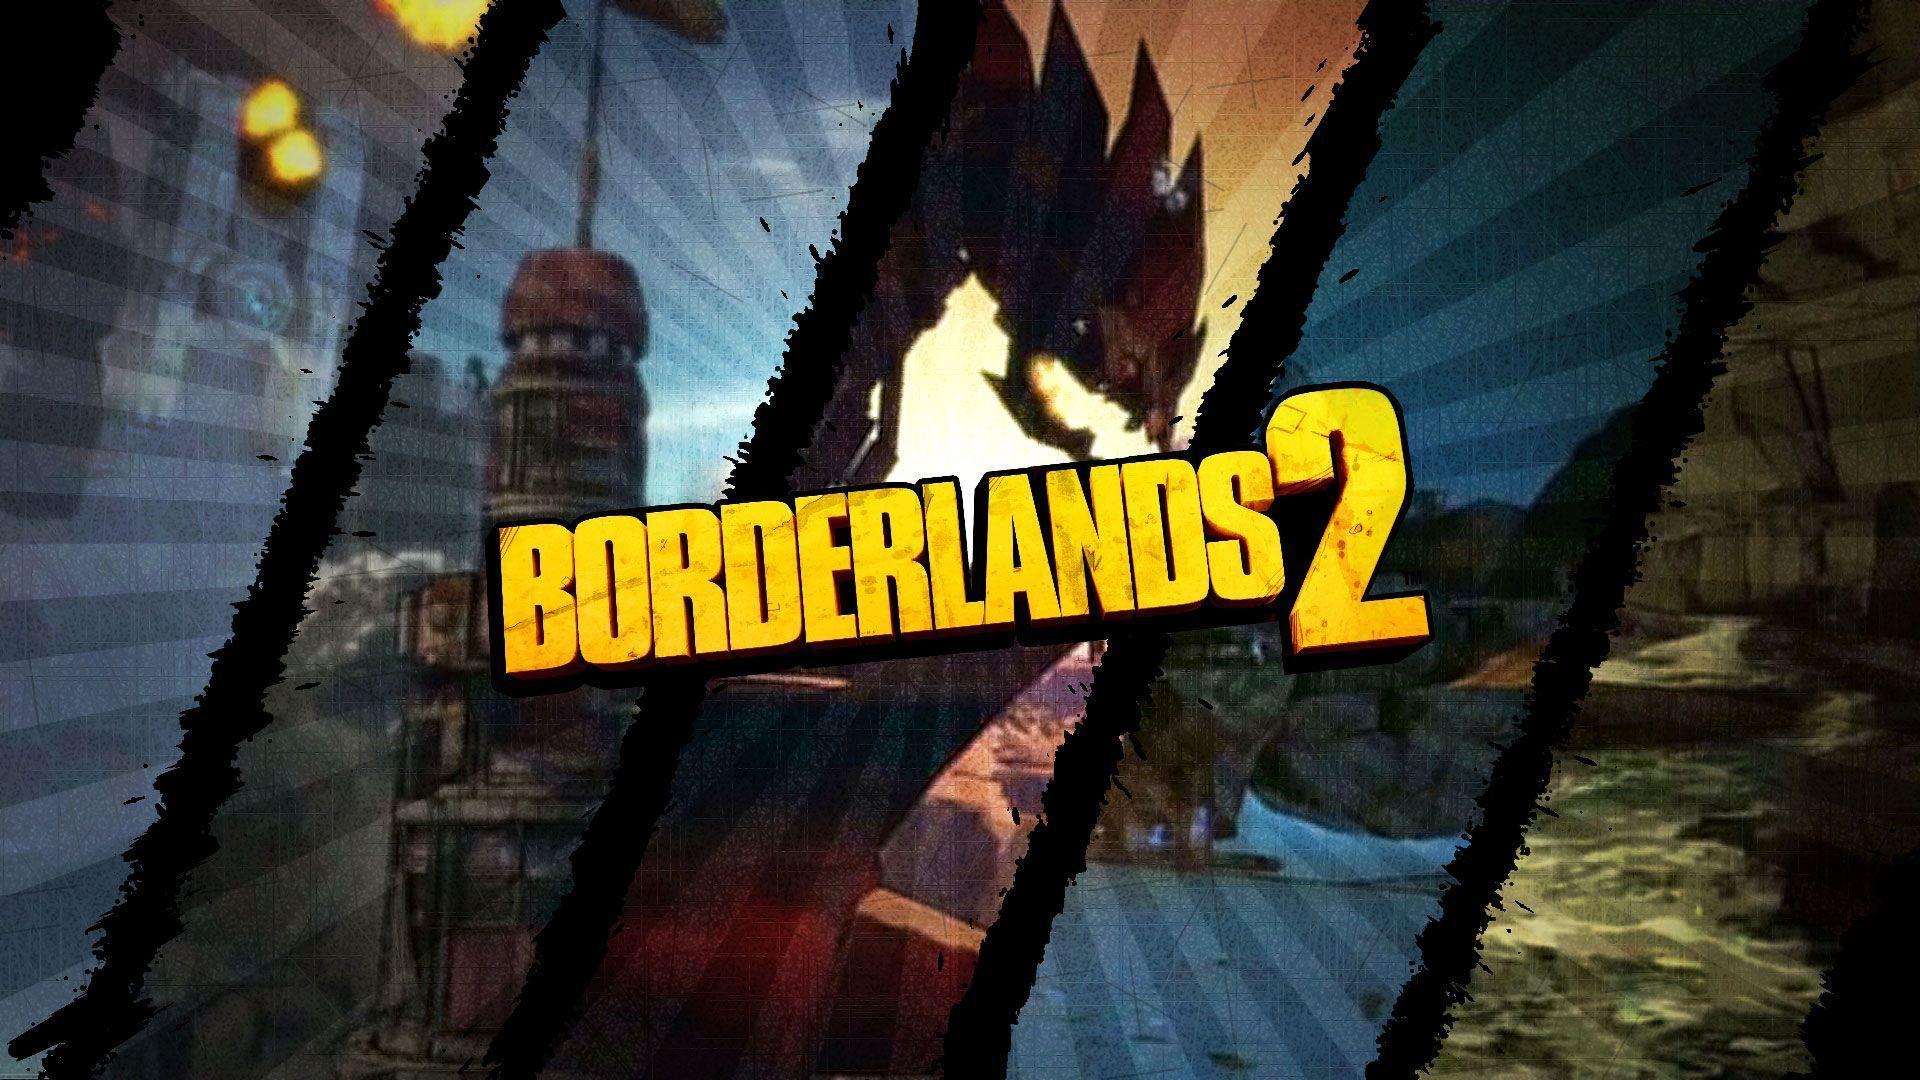 borderlands 2 wallpapers hd wallpaper cave